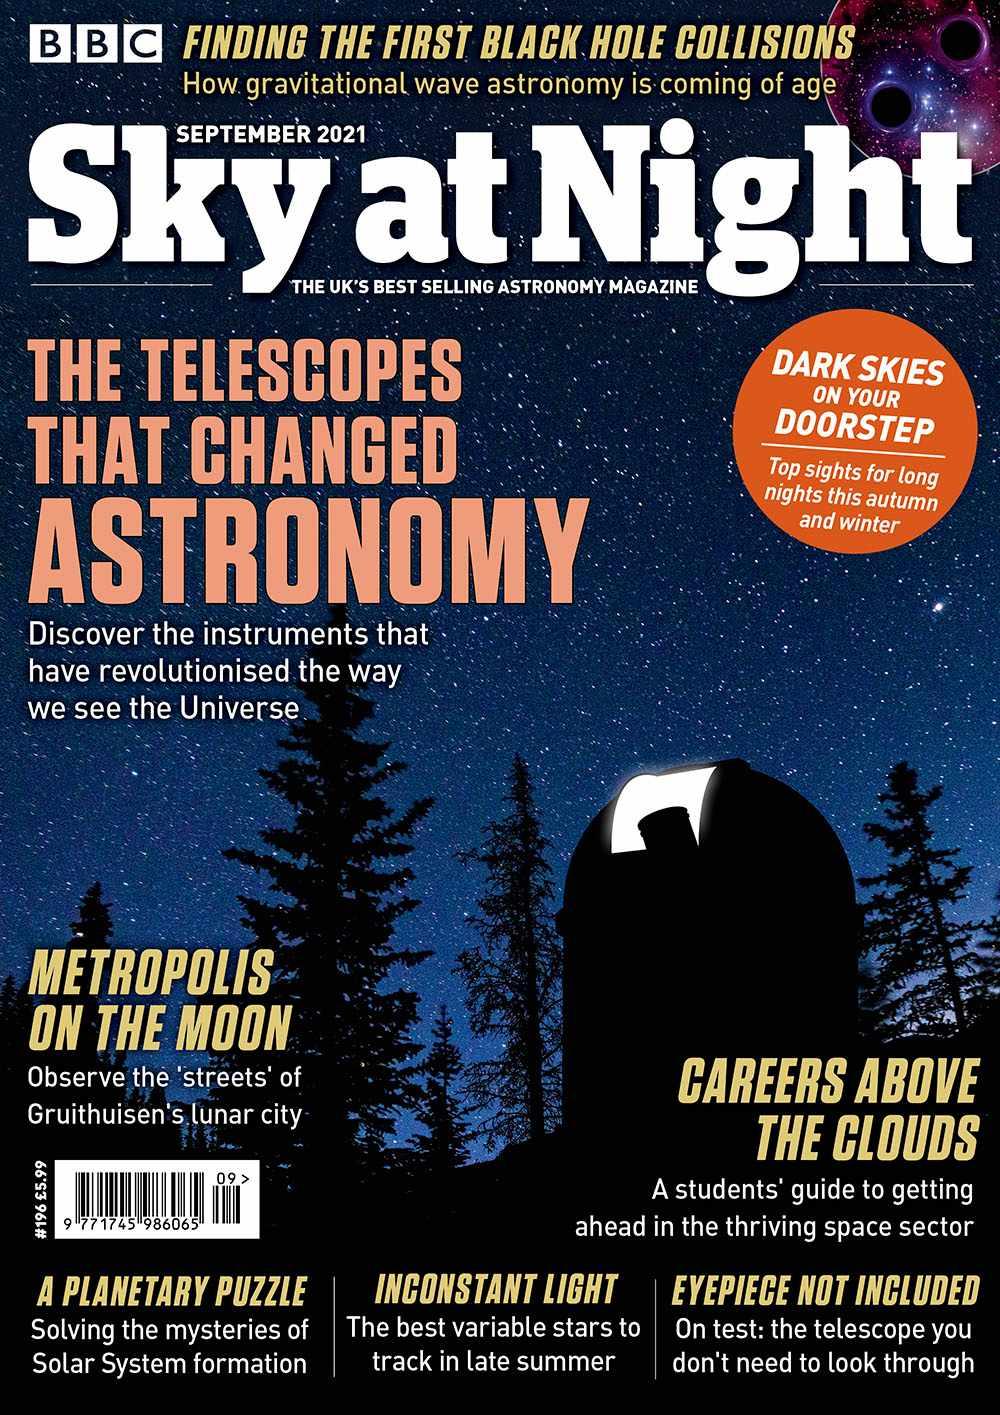 BBC Sky at Night Magazine September 2021 issue